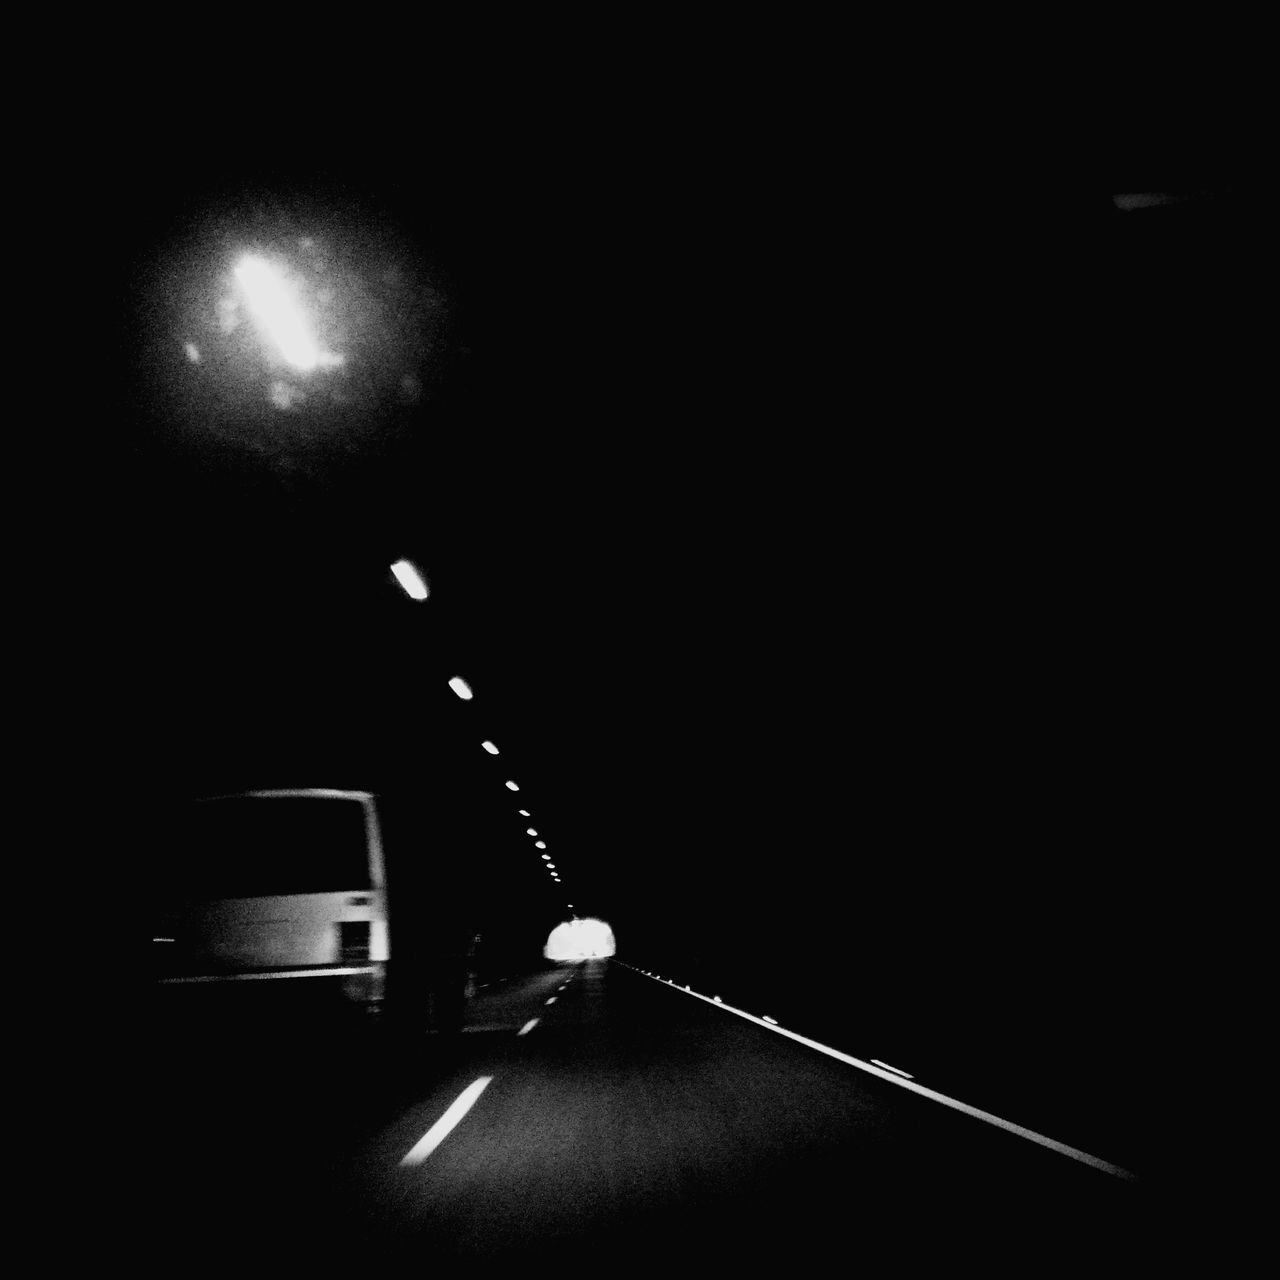 night, transportation, illuminated, mode of transport, road, land vehicle, car, no people, outdoors